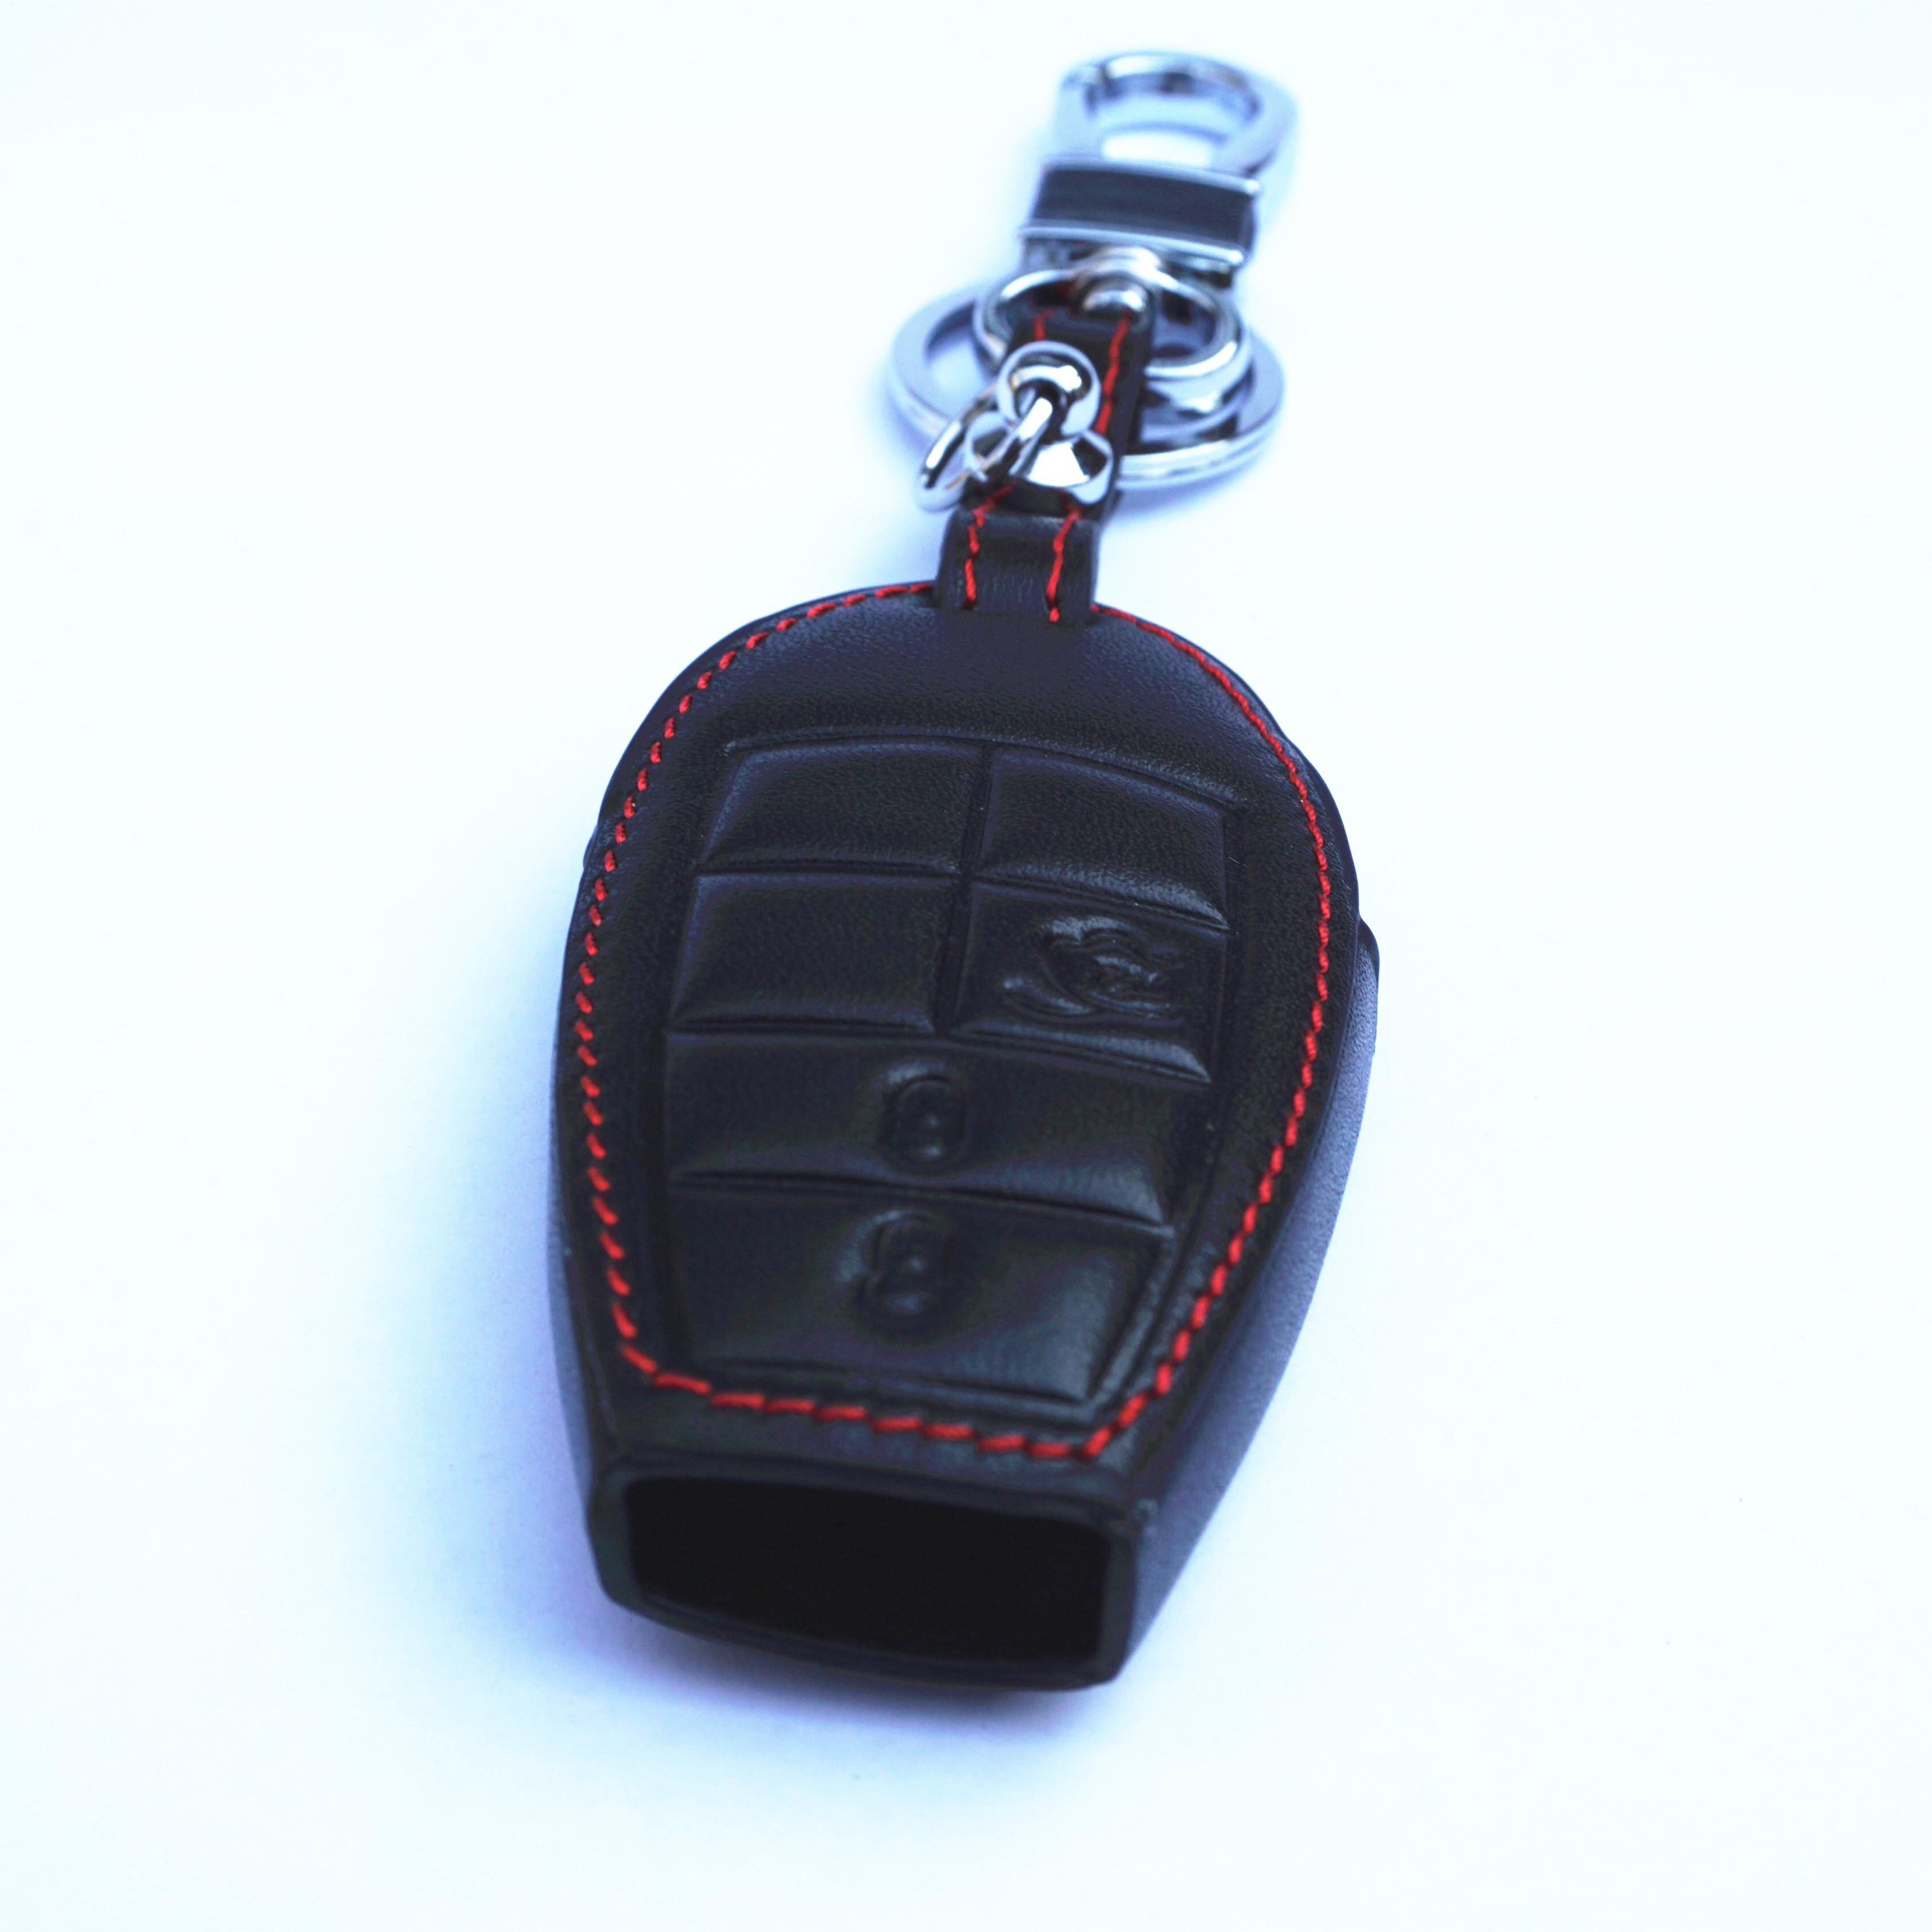 Chrysler Logo Black Leather Strap Key Chain Key-Ring iPick Image